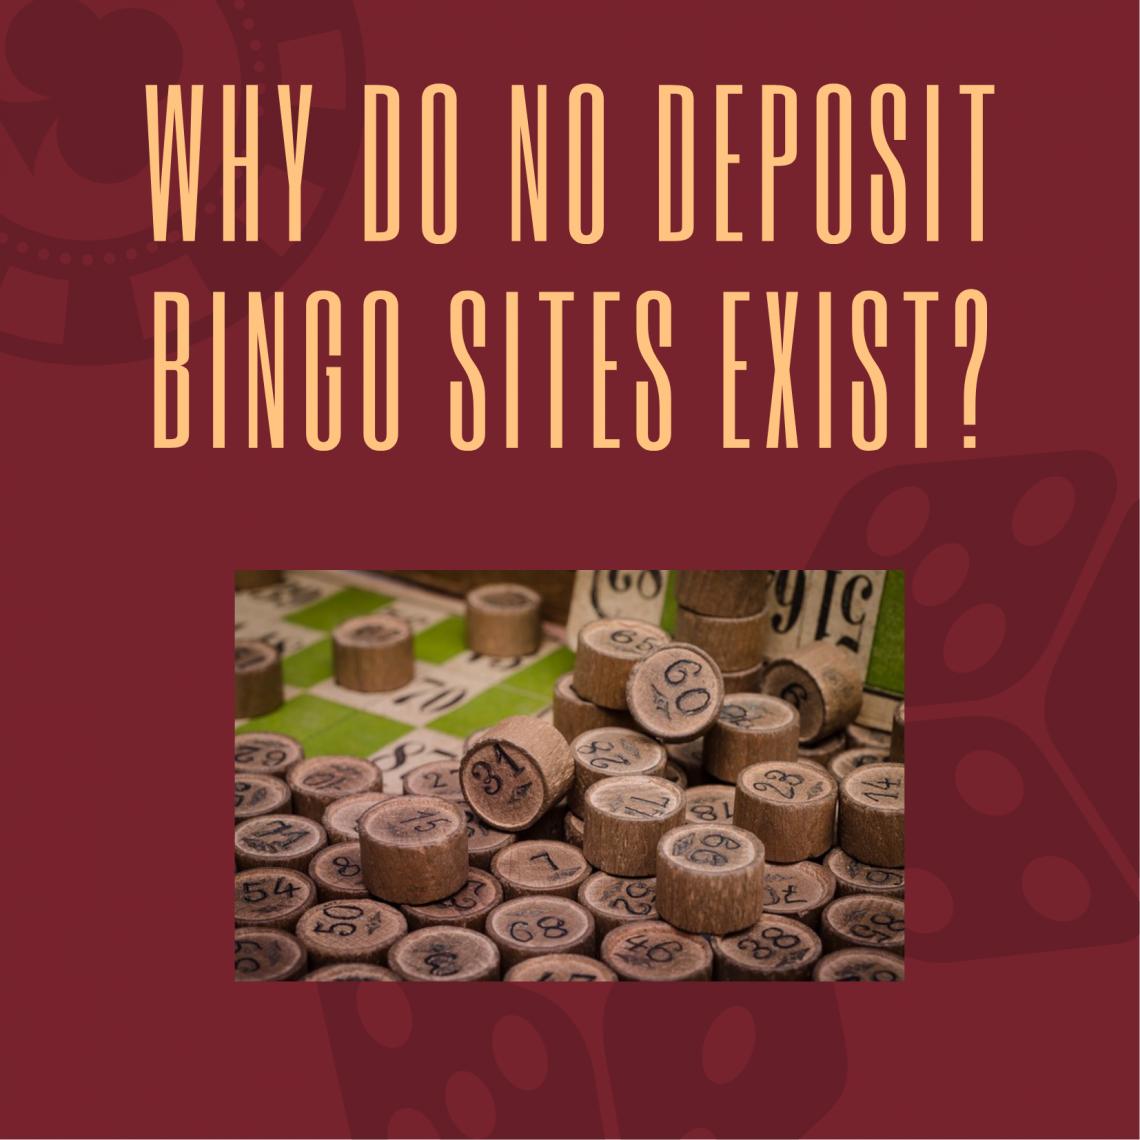 Why Do No Deposit Bingo Sites Exist?